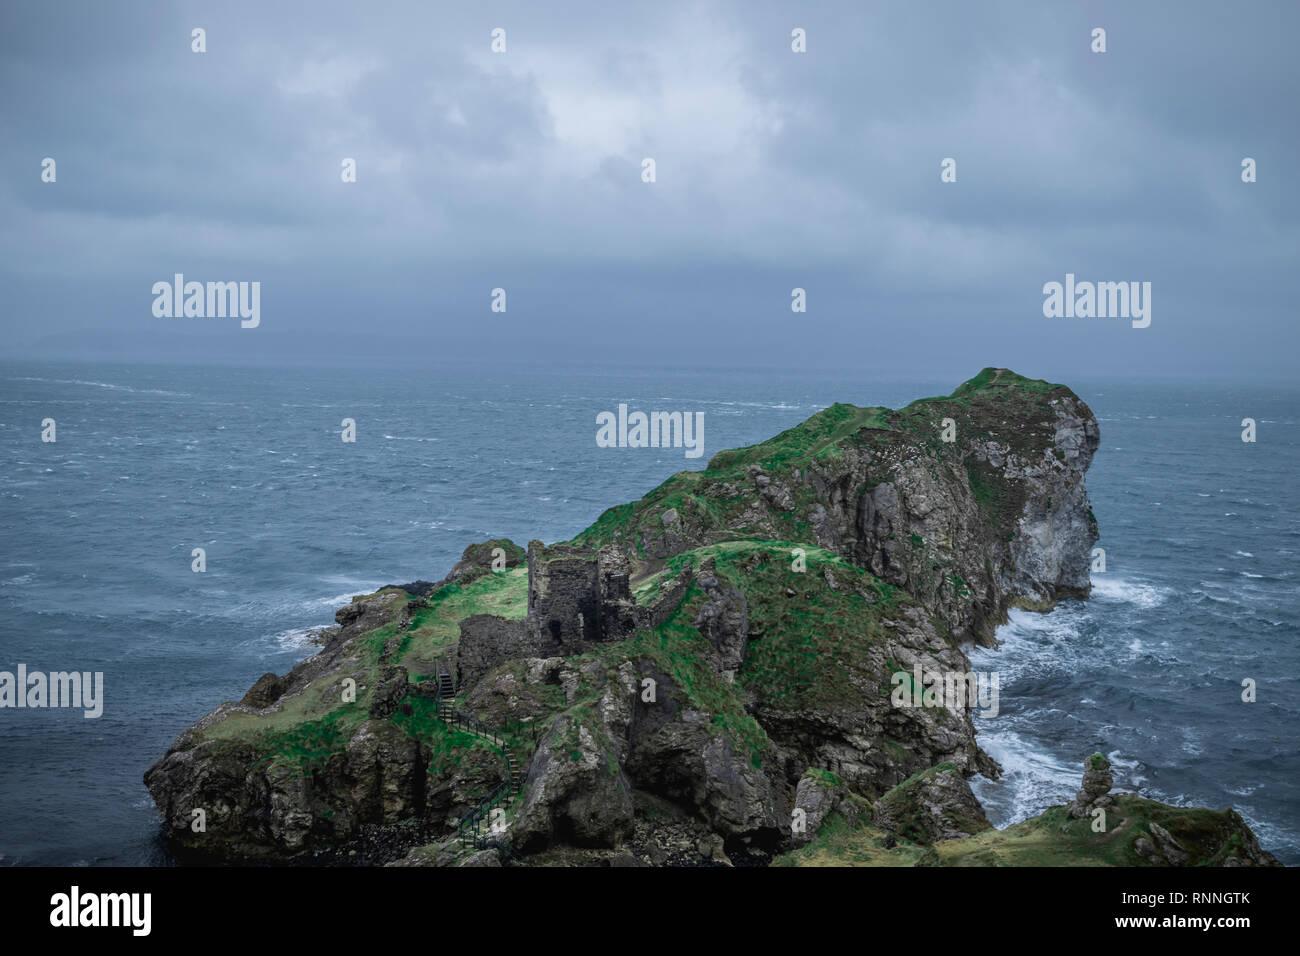 Kinbane Head on the Coast of Northern Ireland - Stock Image